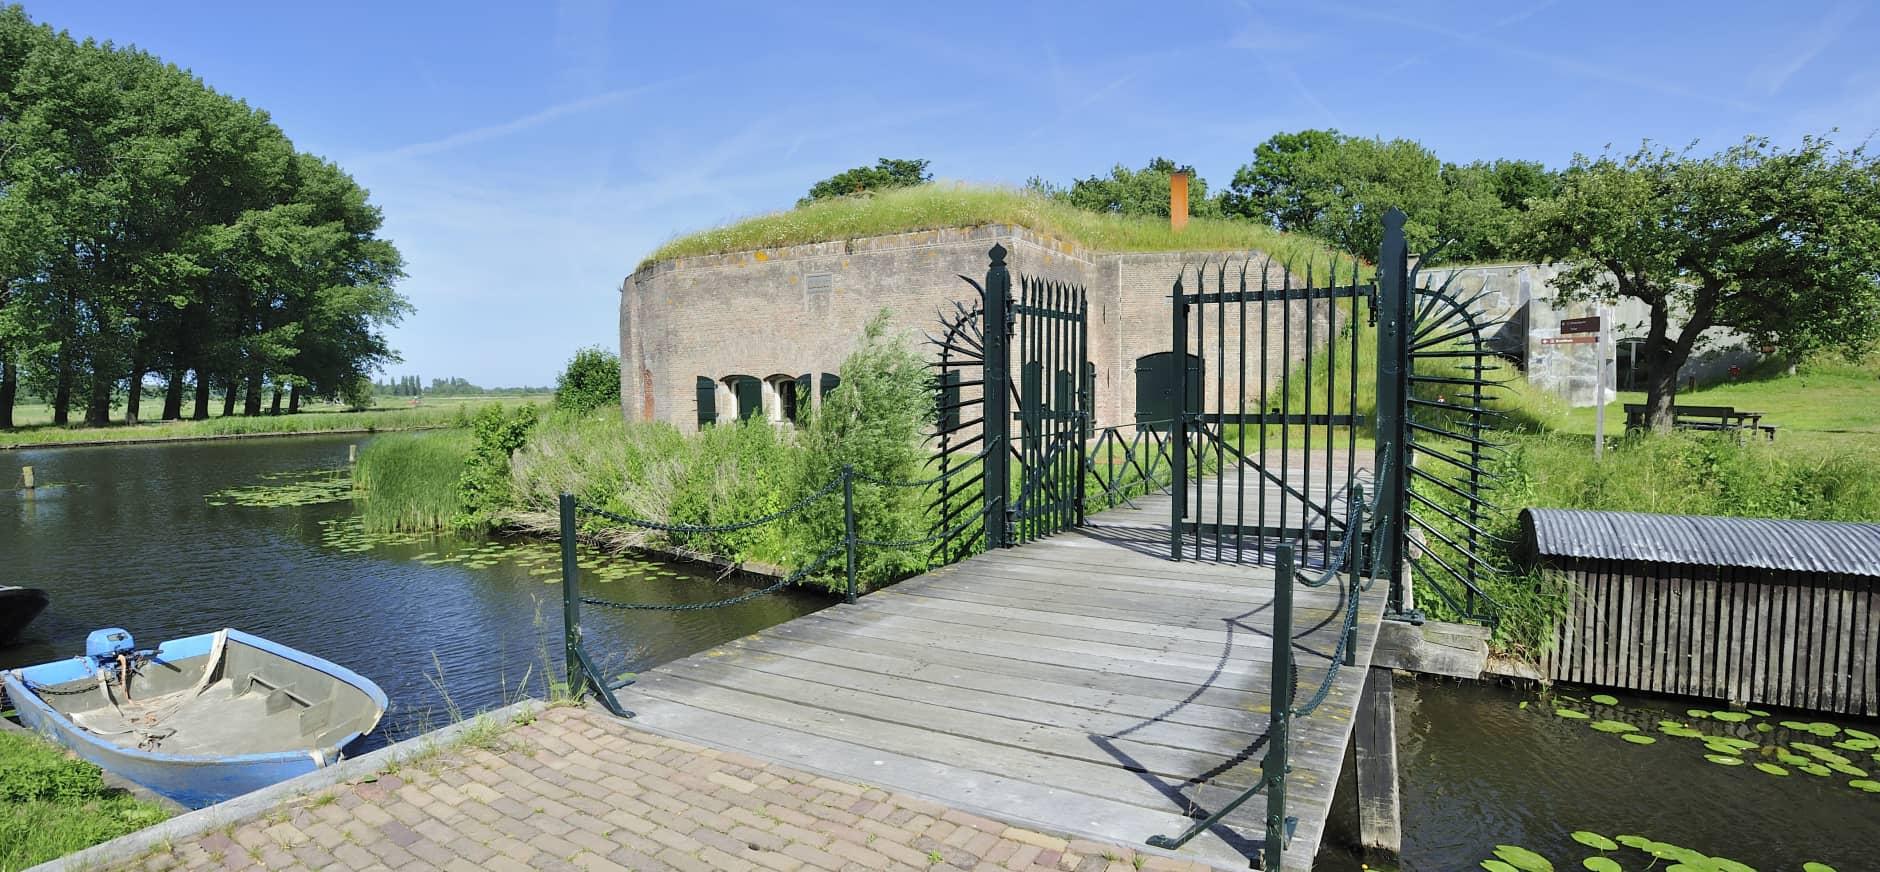 Fort Kijkuit